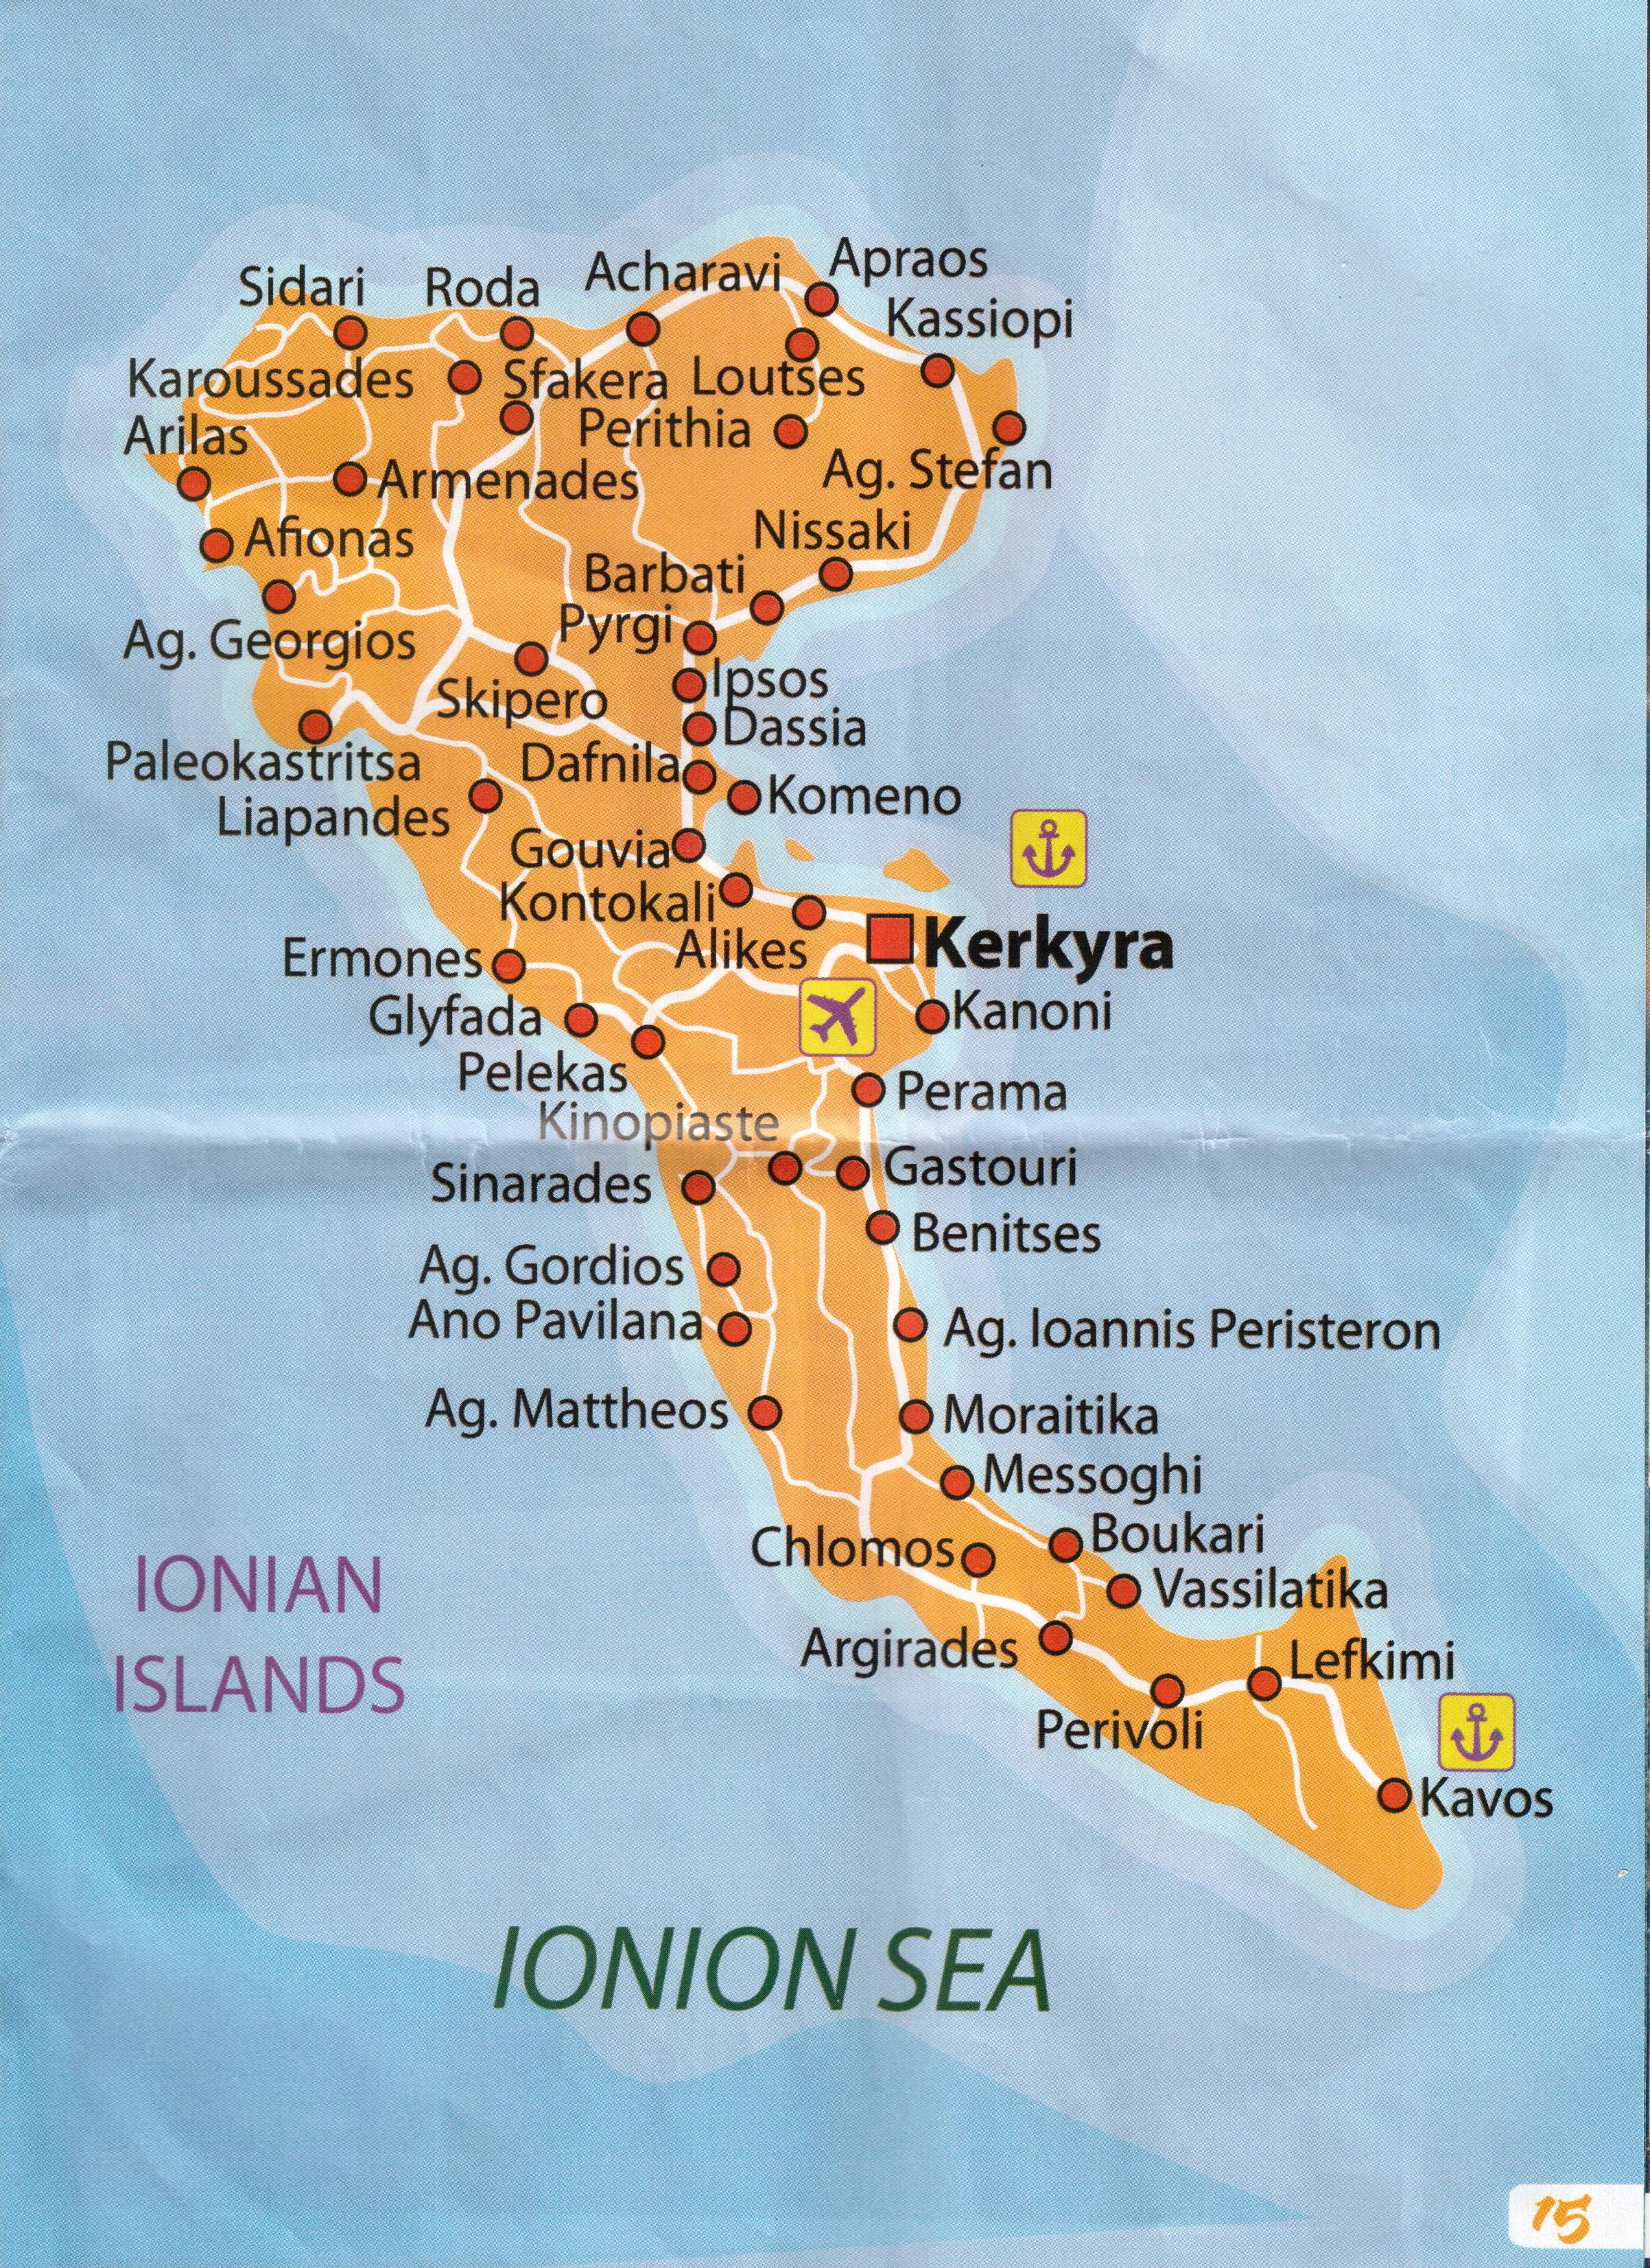 Datoteka Krf1 Mapa Jpg Vikipedija Slobodna Enciklopedija